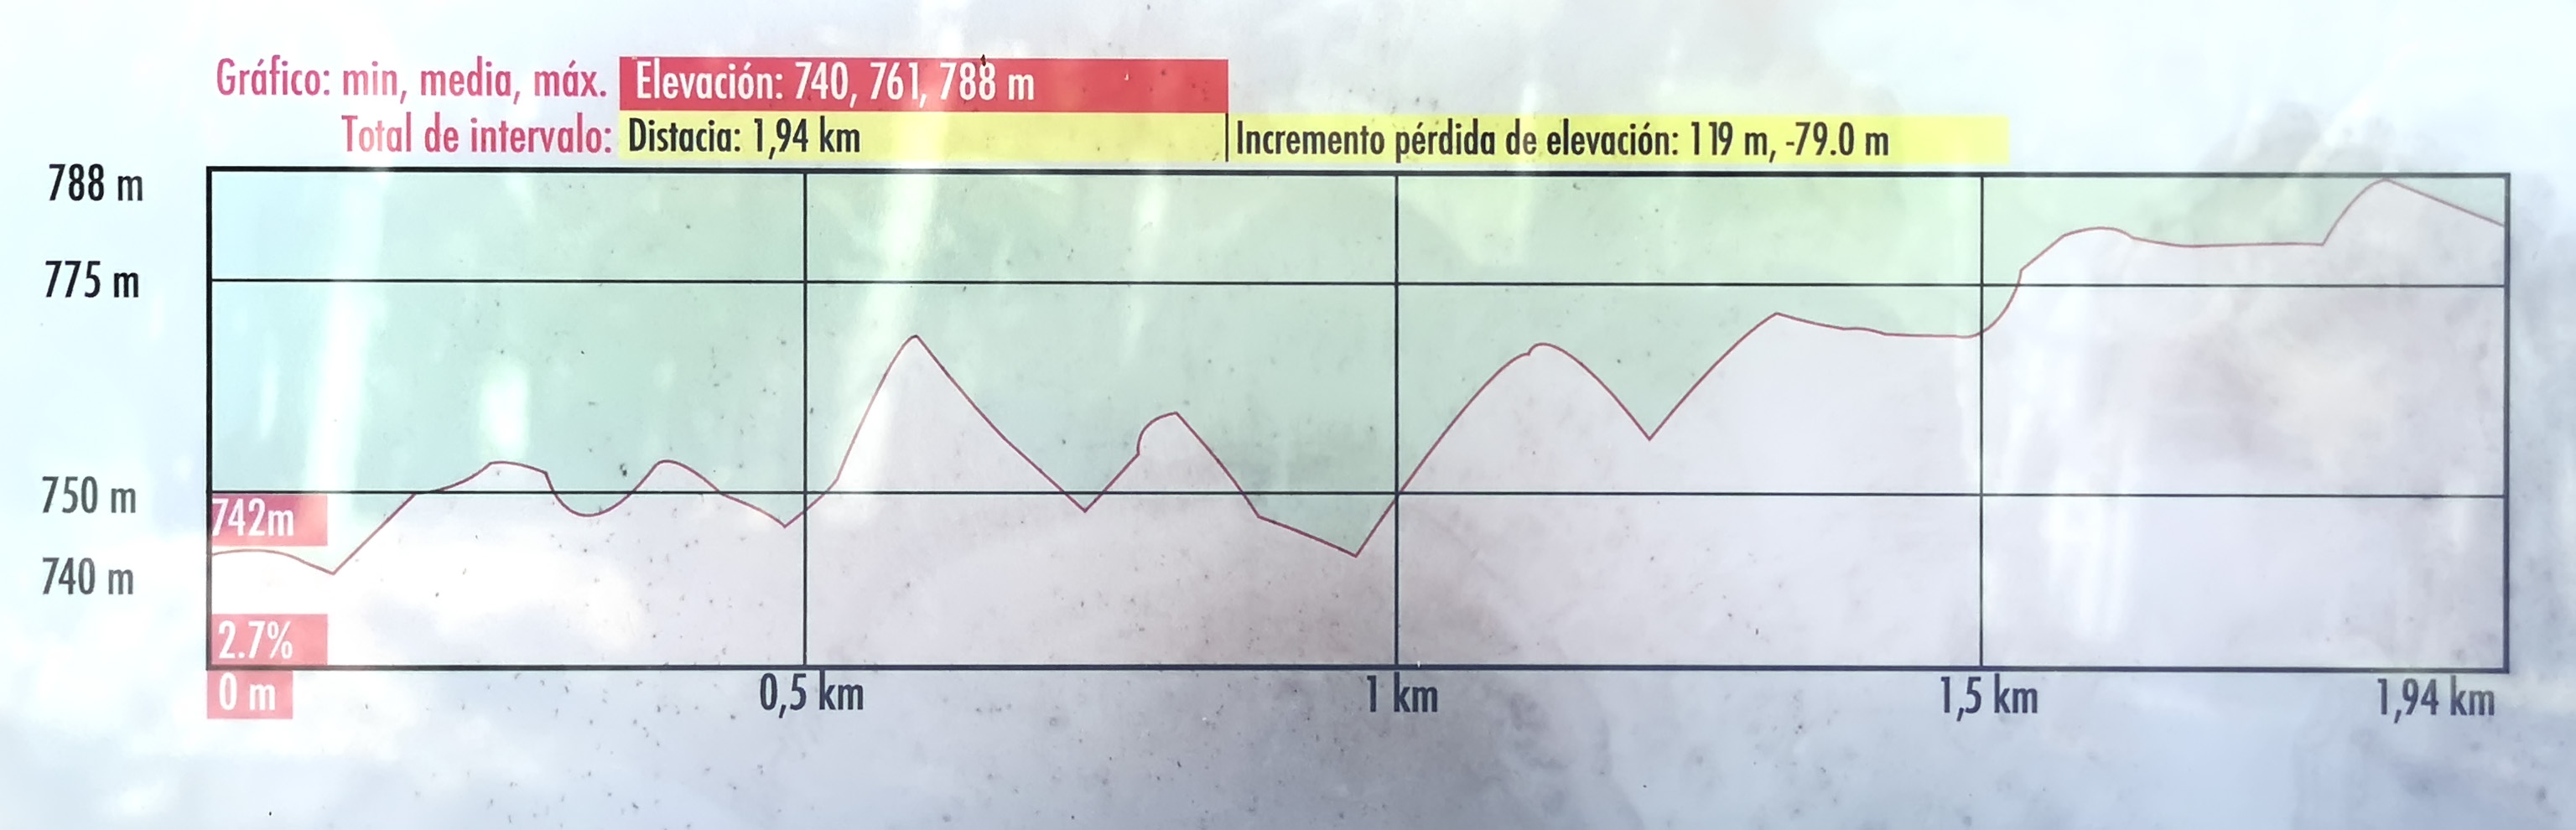 Perfil de la Ruta Arbillas - TiétarTeVe